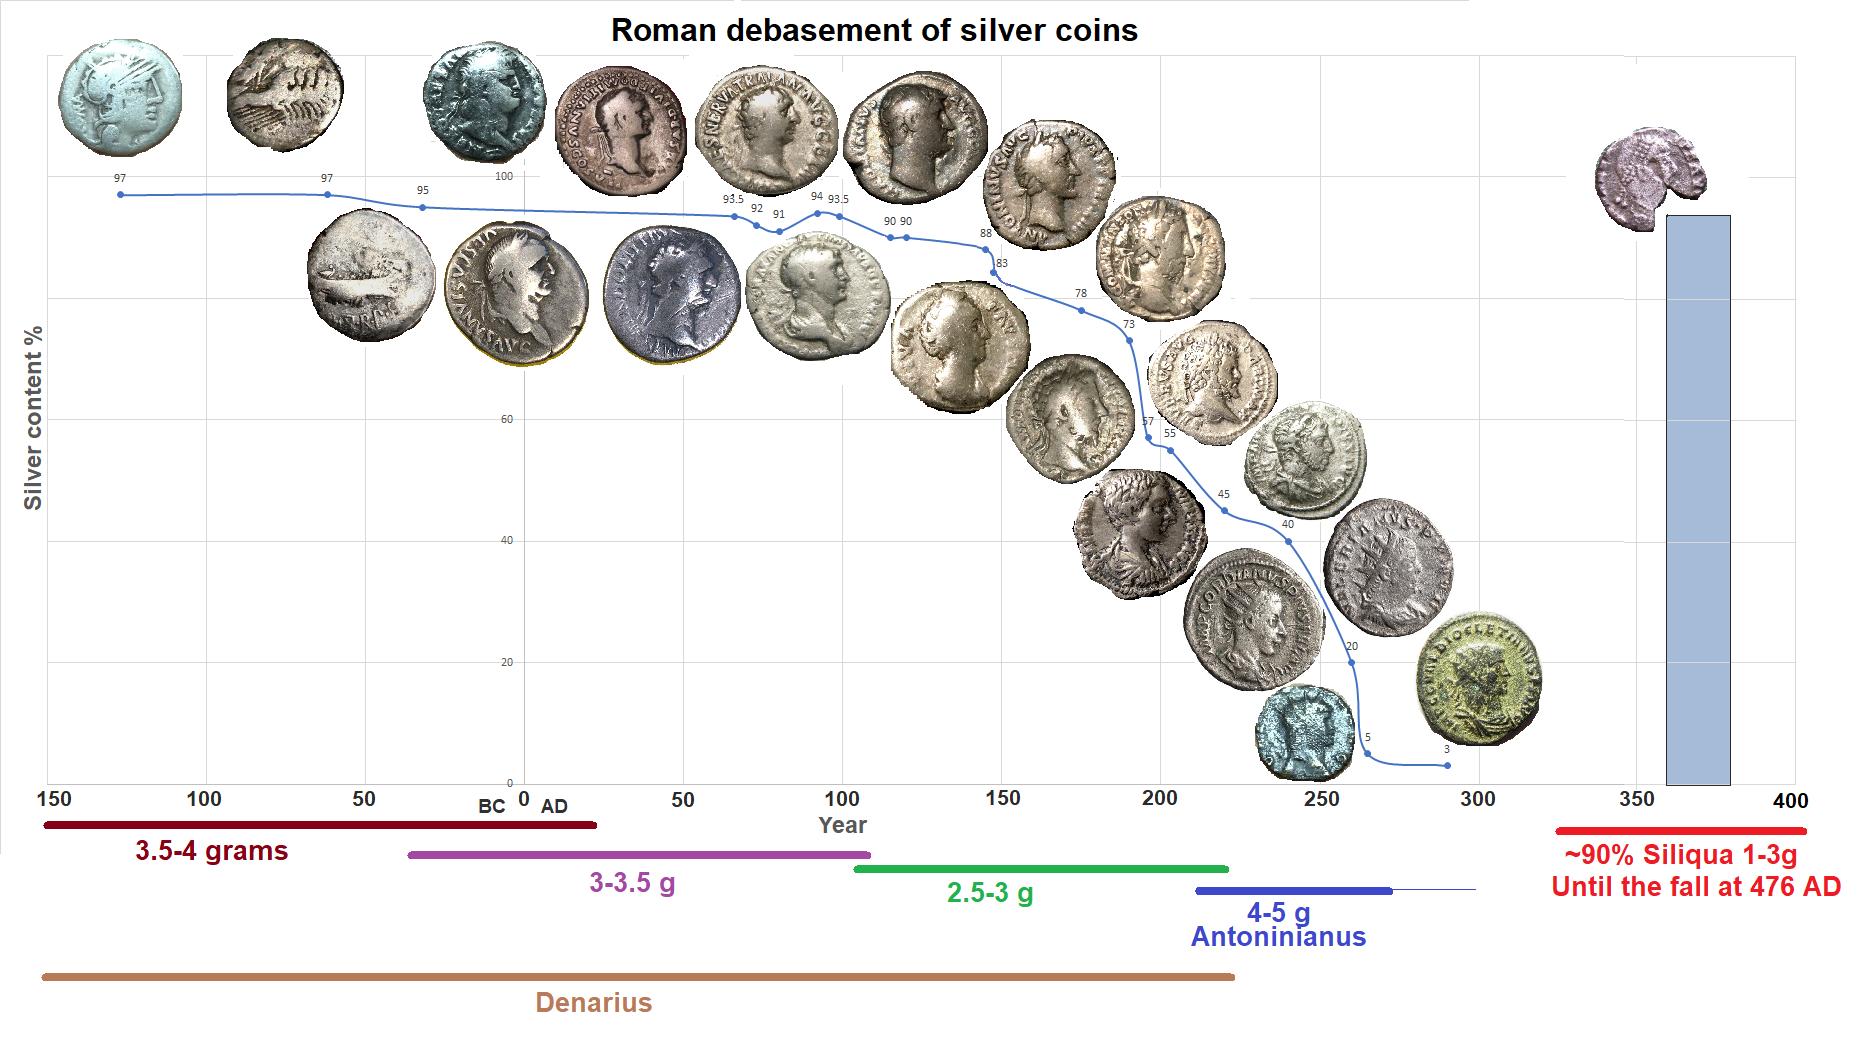 Roman debasement of silver coins